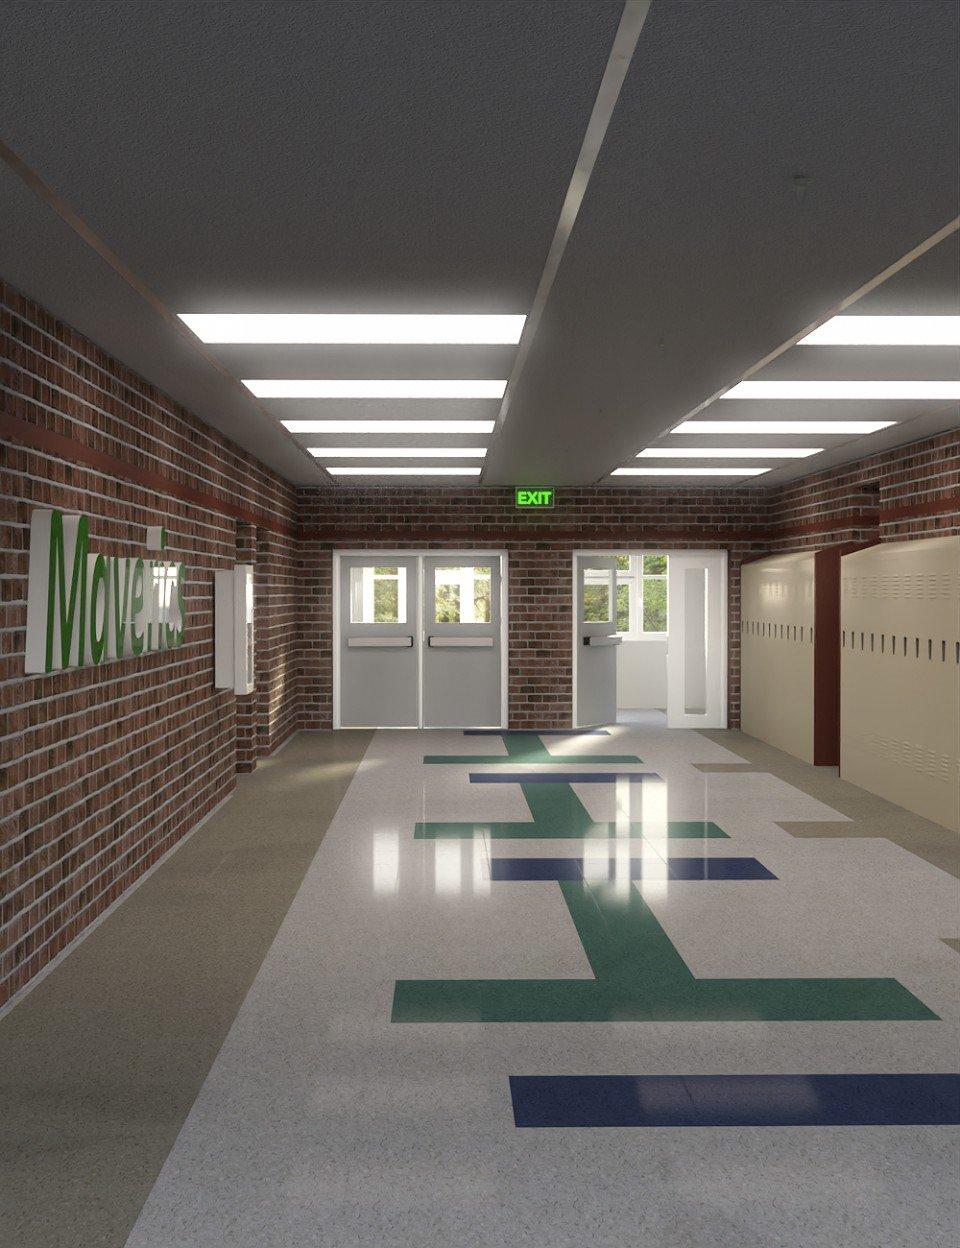 High School Hallway 2_DAZ3D下载站